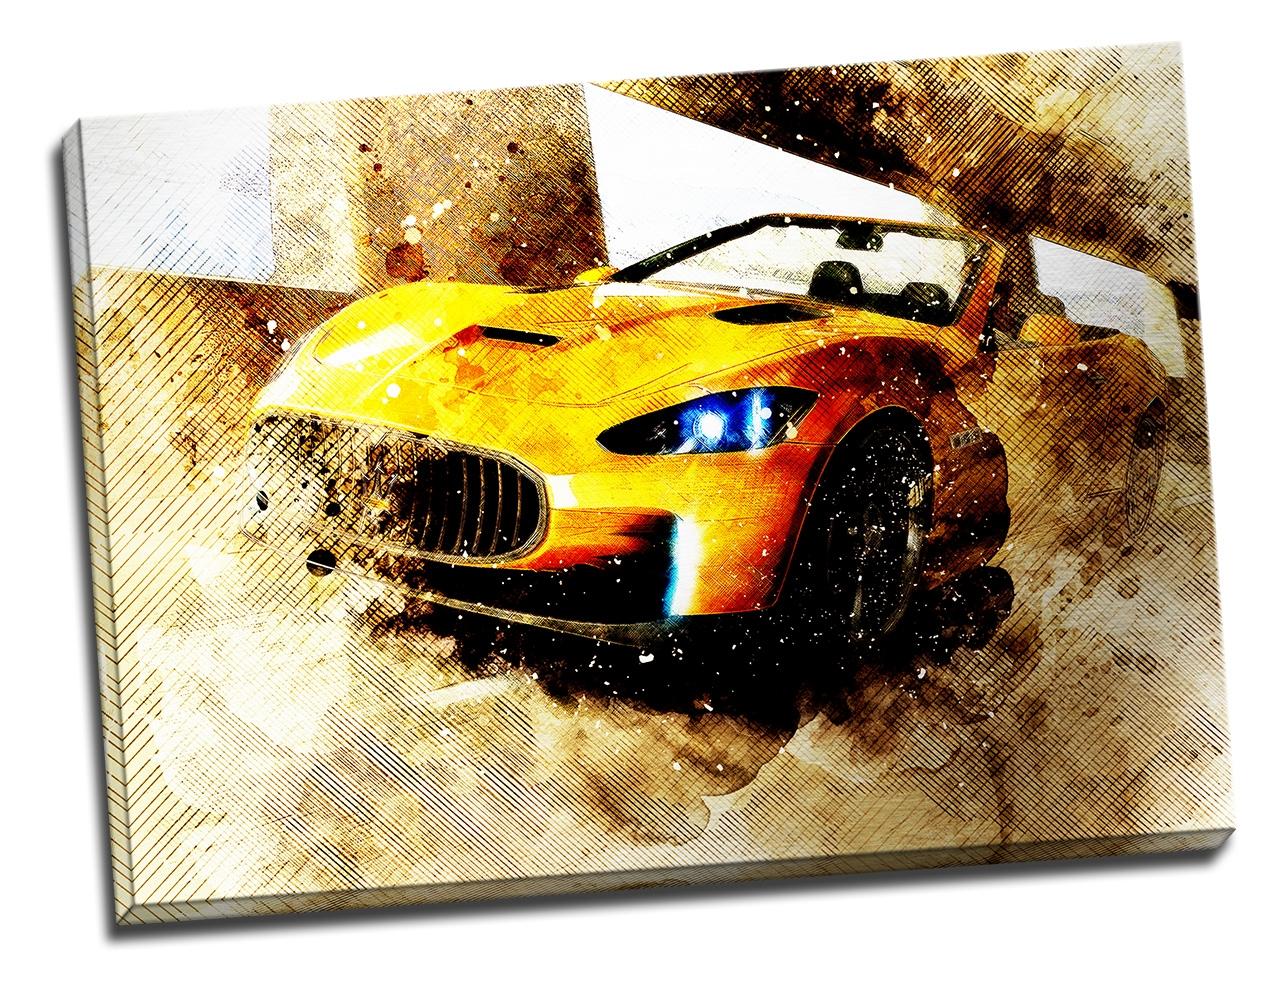 Tablou din aluminiu striat Yellow Supercar